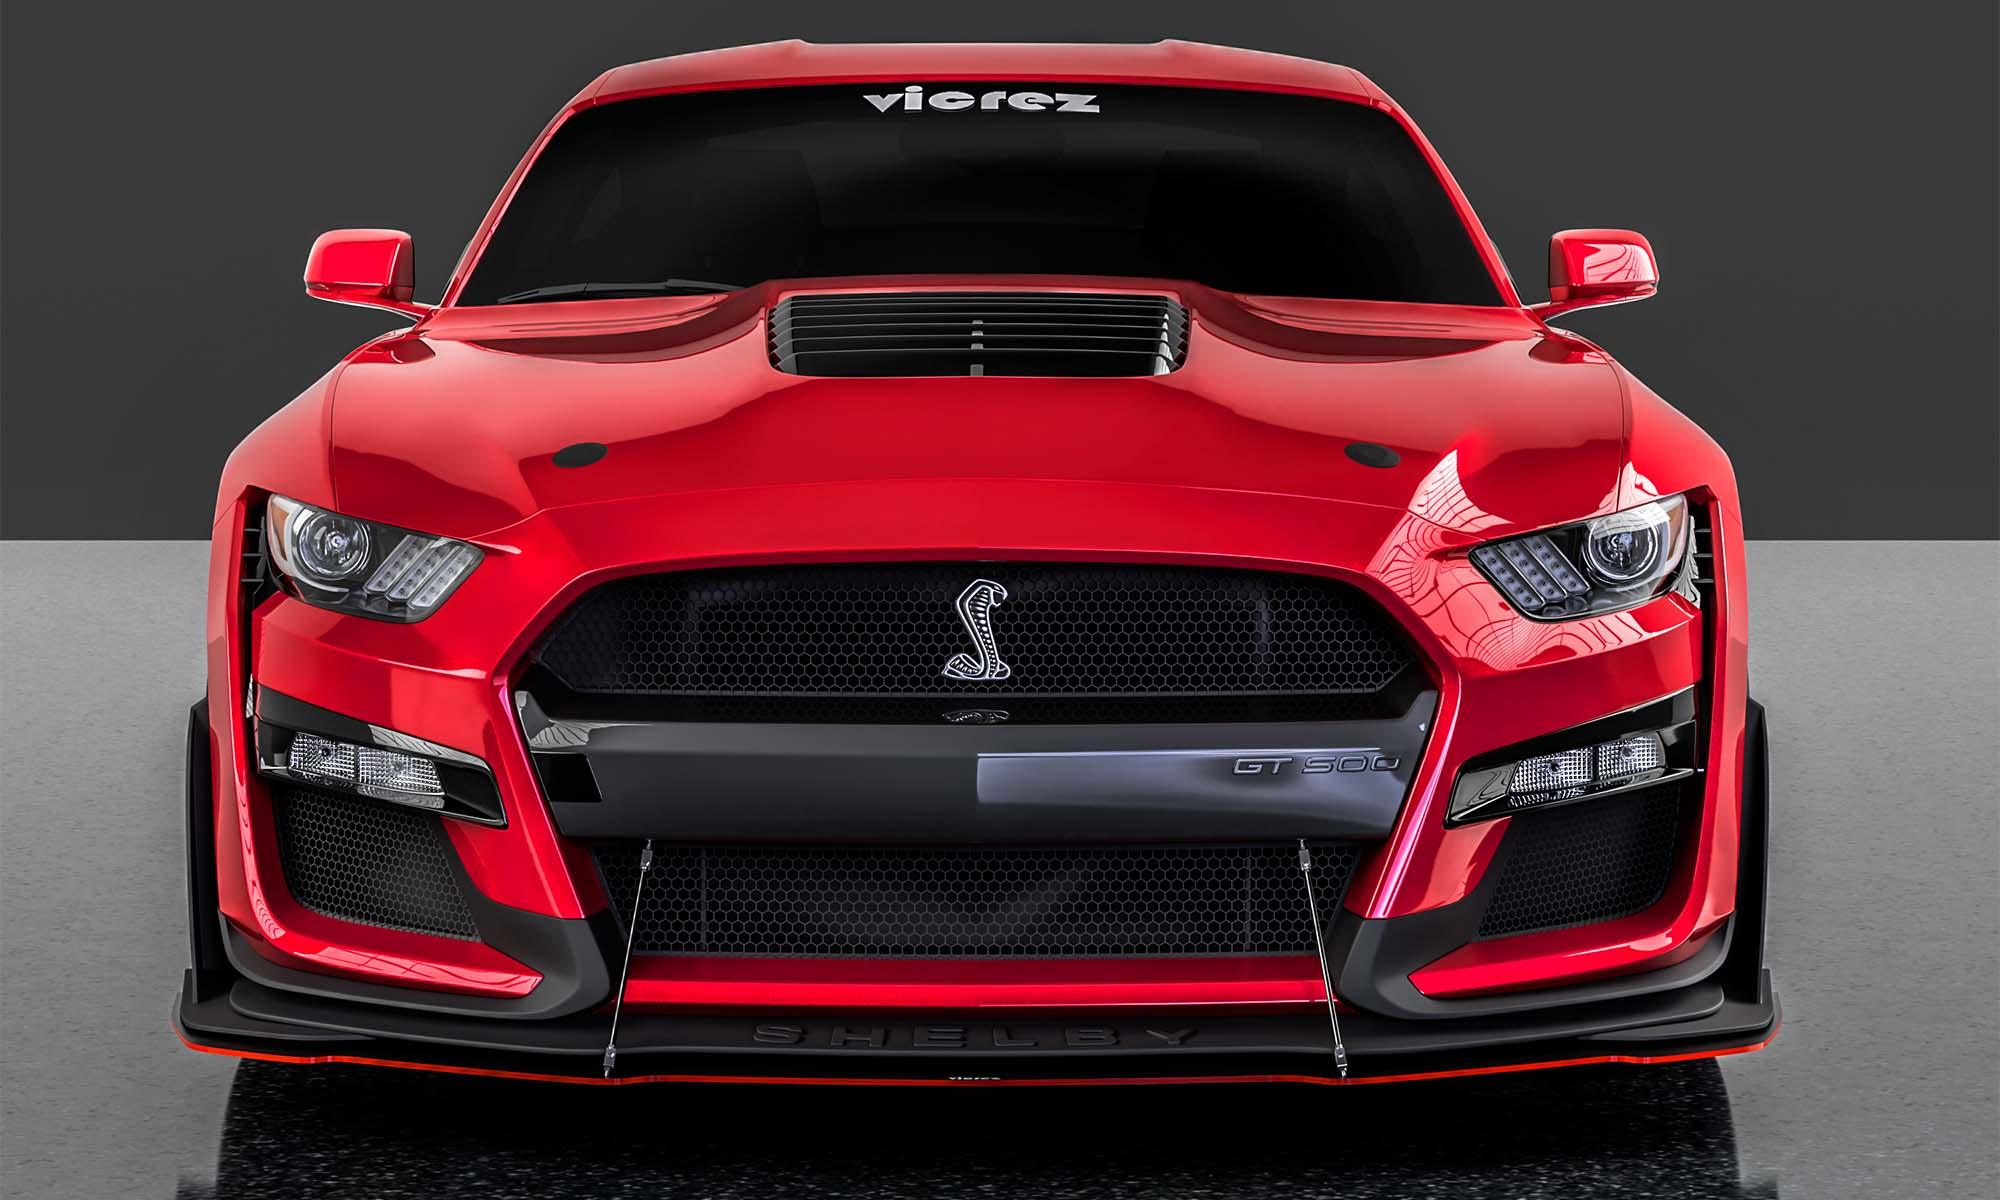 Vicrez Ford Mustang 2018 LV style Front Bumper Lip Splitter vz100957